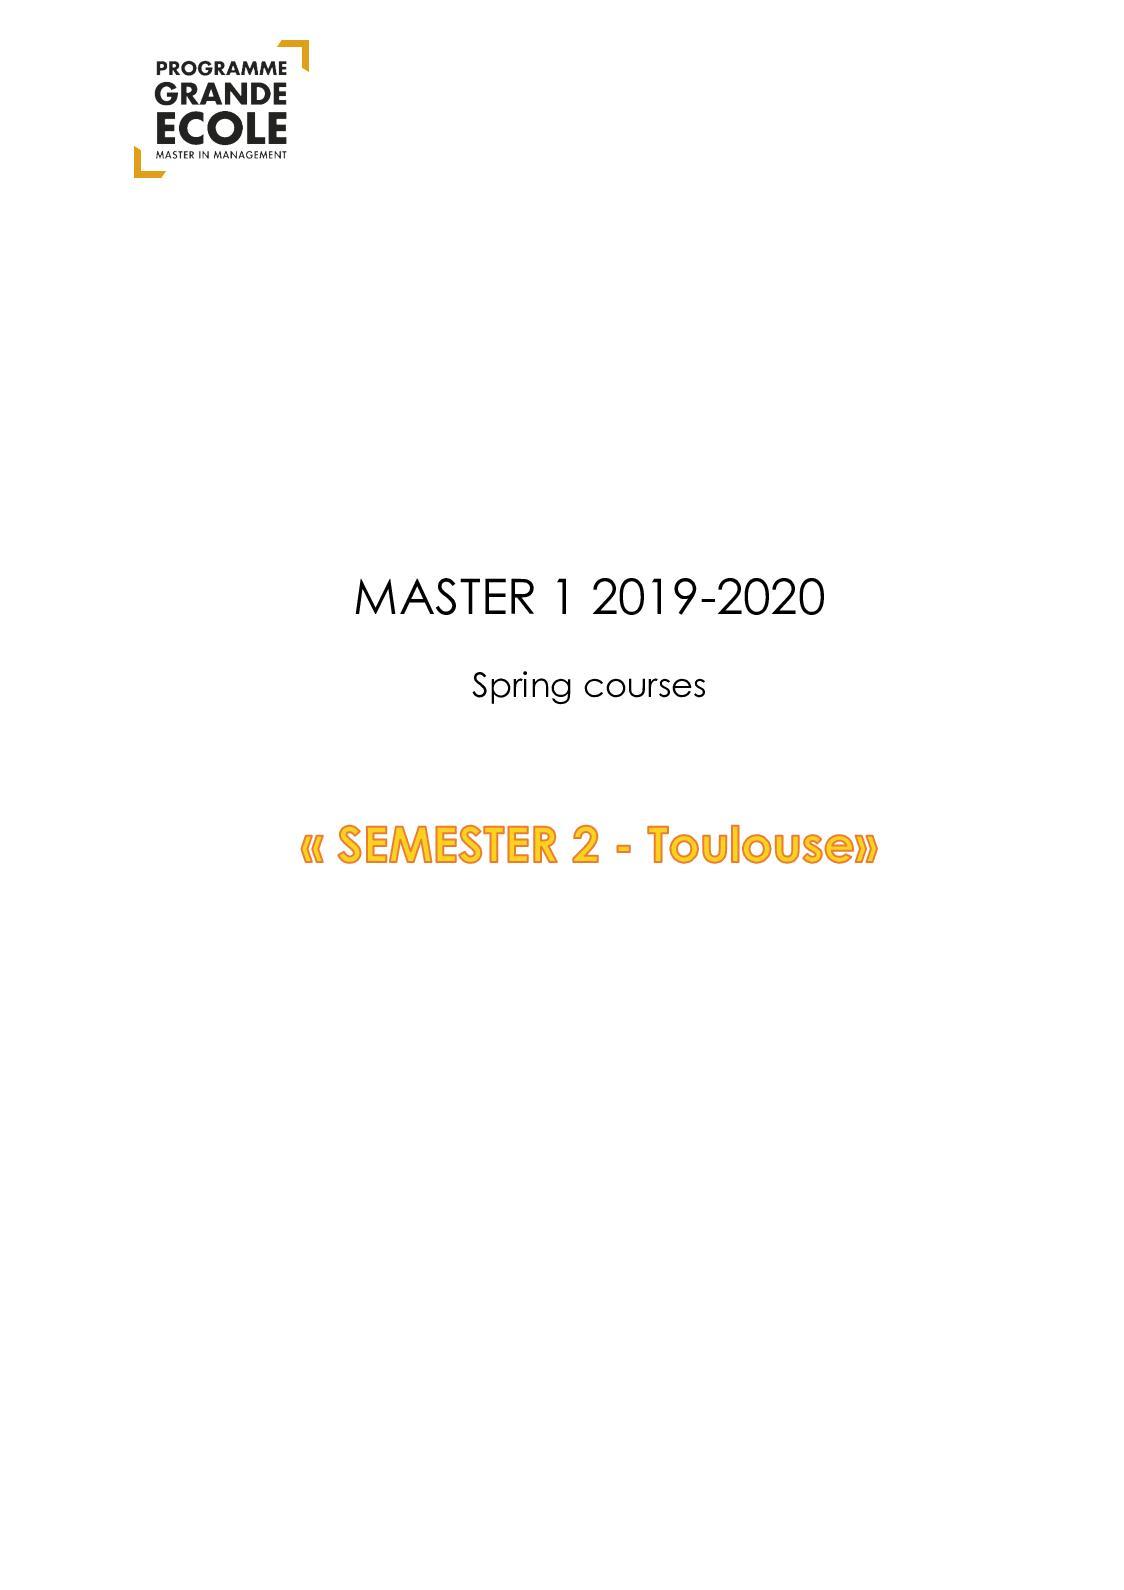 Maison Du Convertible Sebastopol calaméo - tbs syllabus s2m1 tlse 20